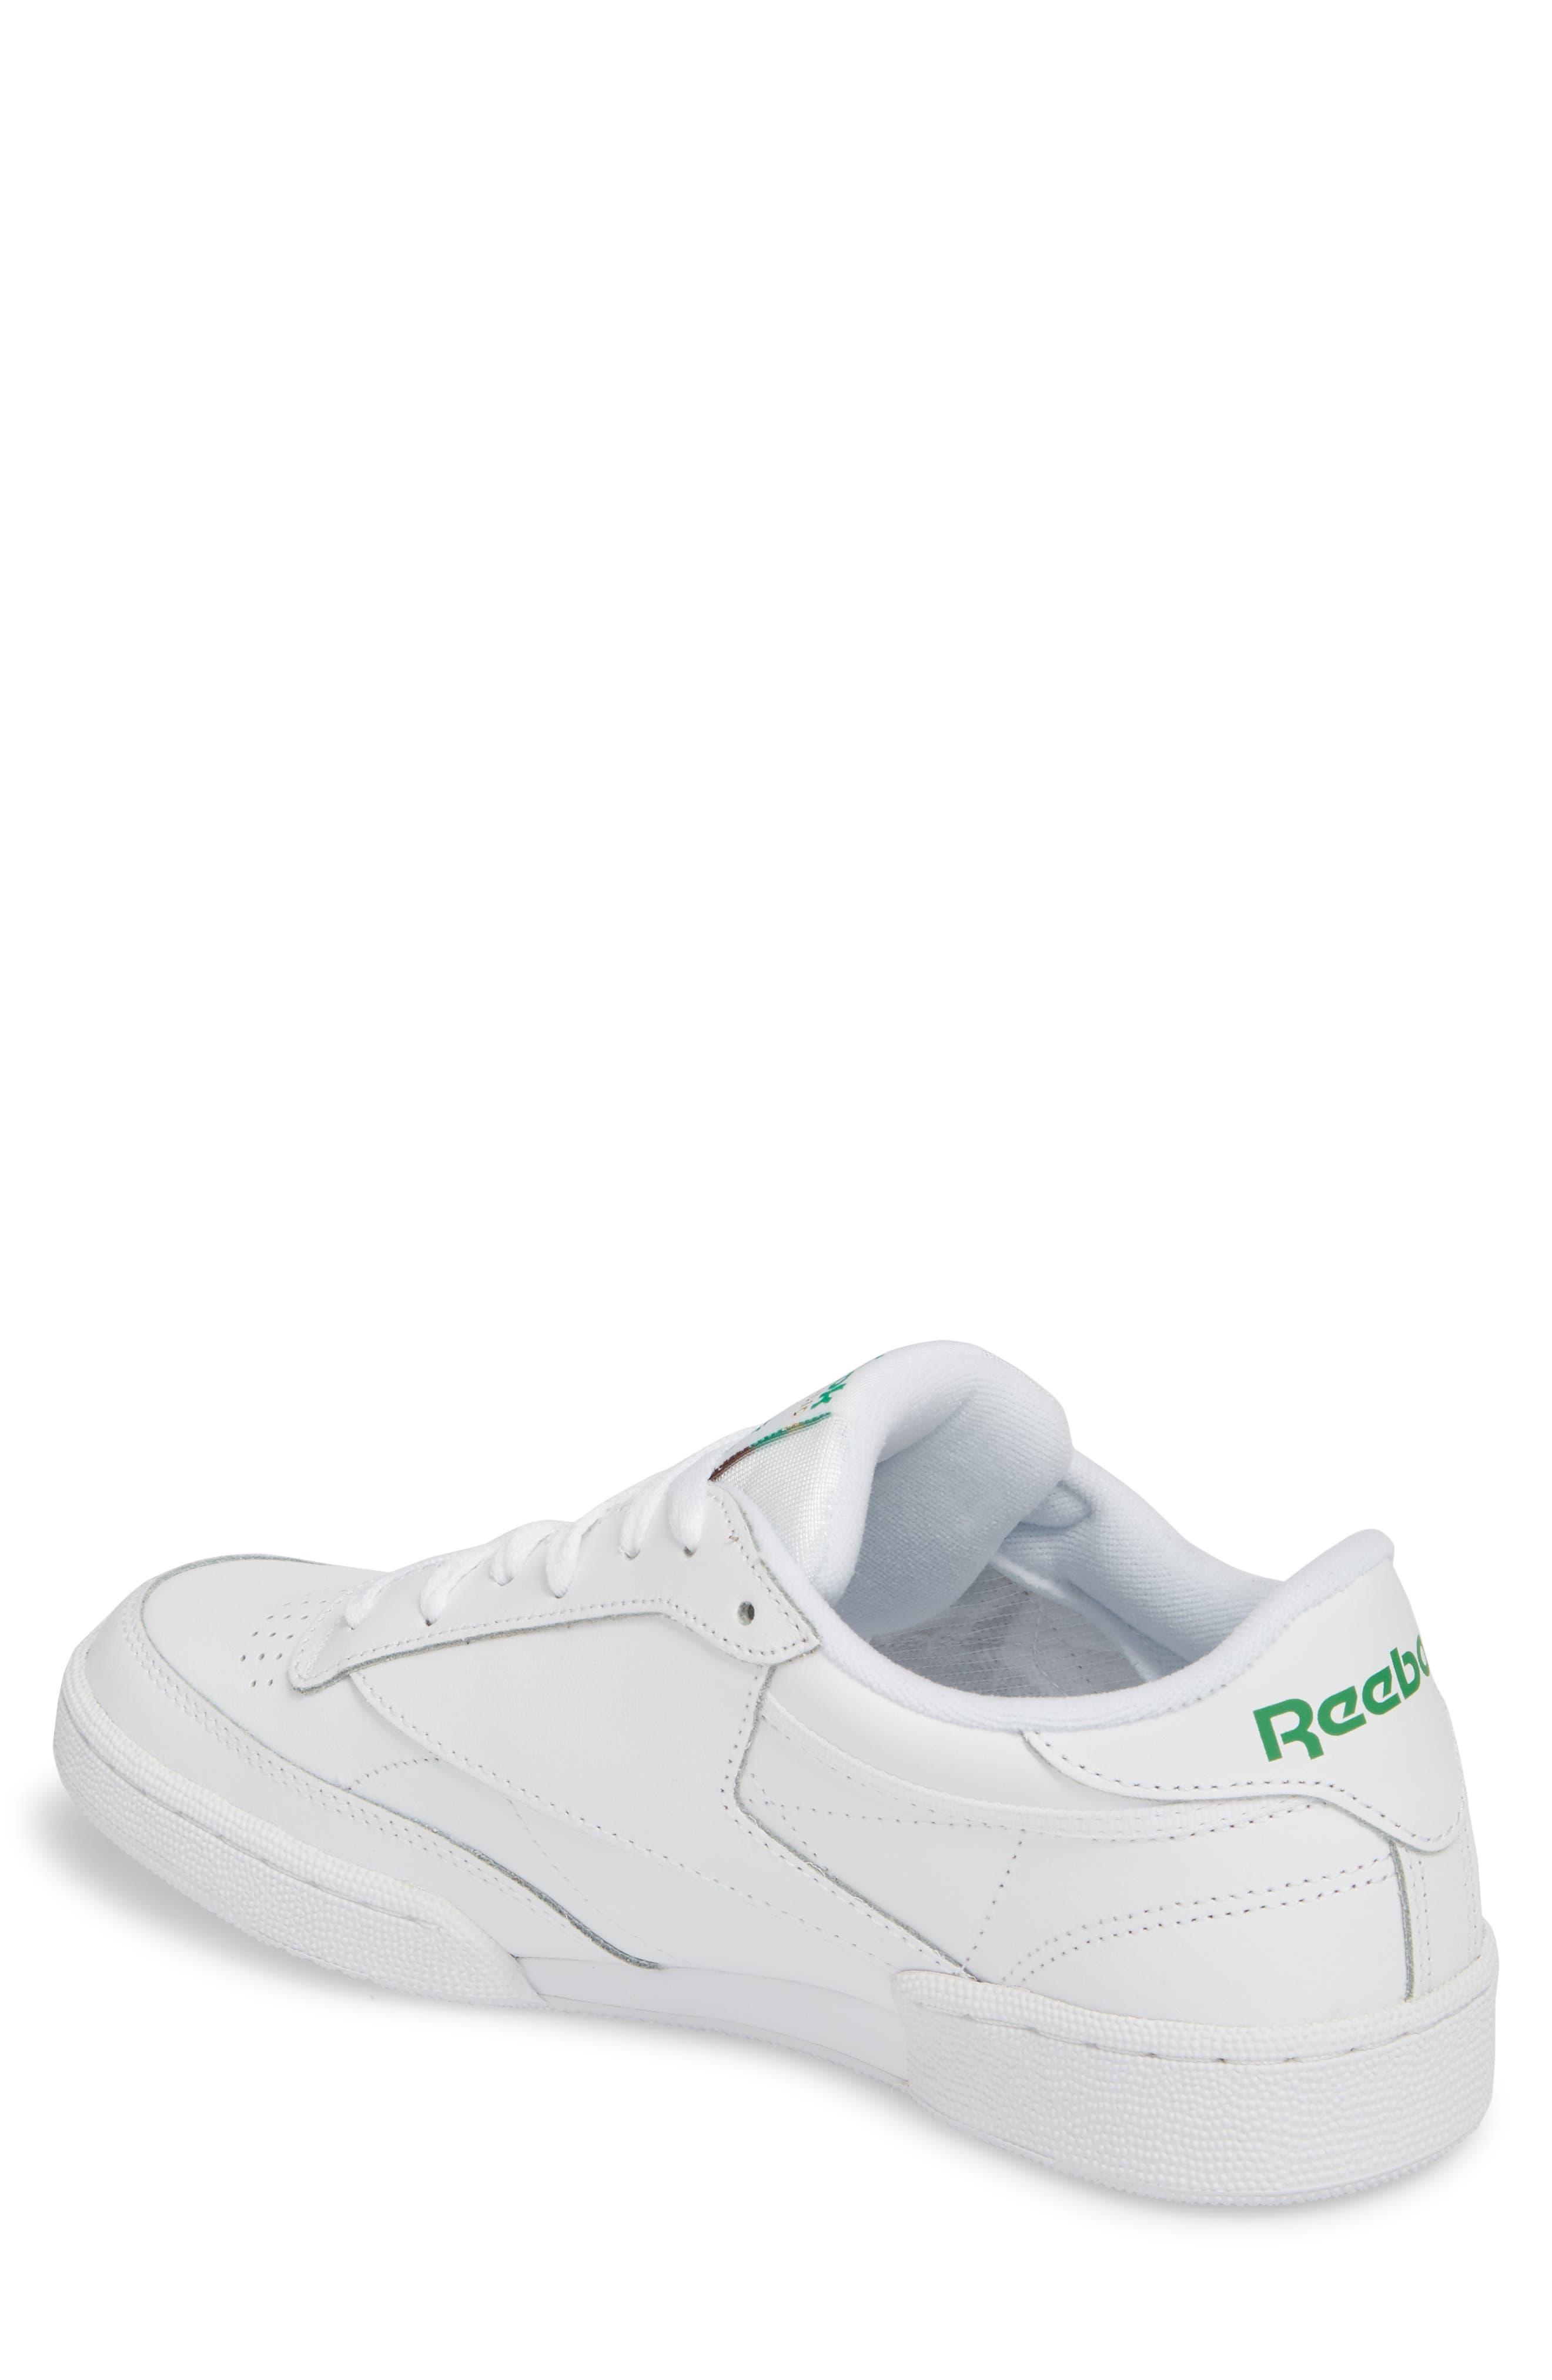 Club C 85 Sneaker,                             Alternate thumbnail 2, color,                             White